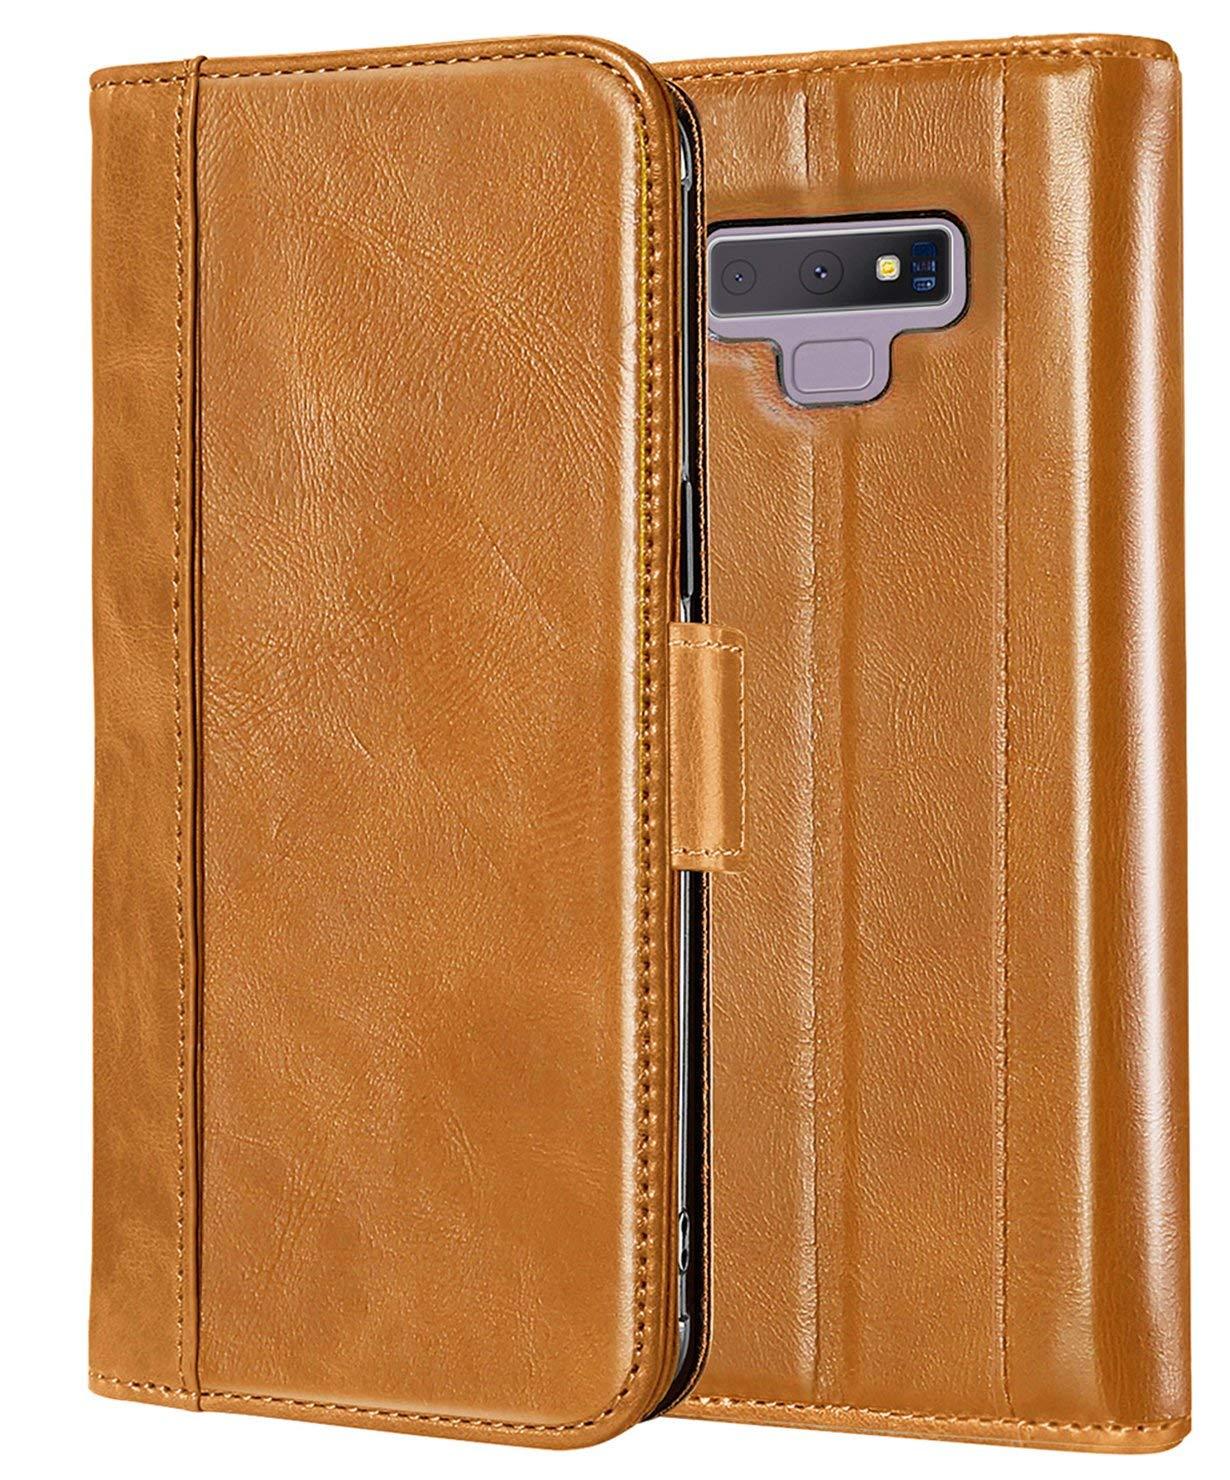 procase-wallet-case-note-9-press.jpg